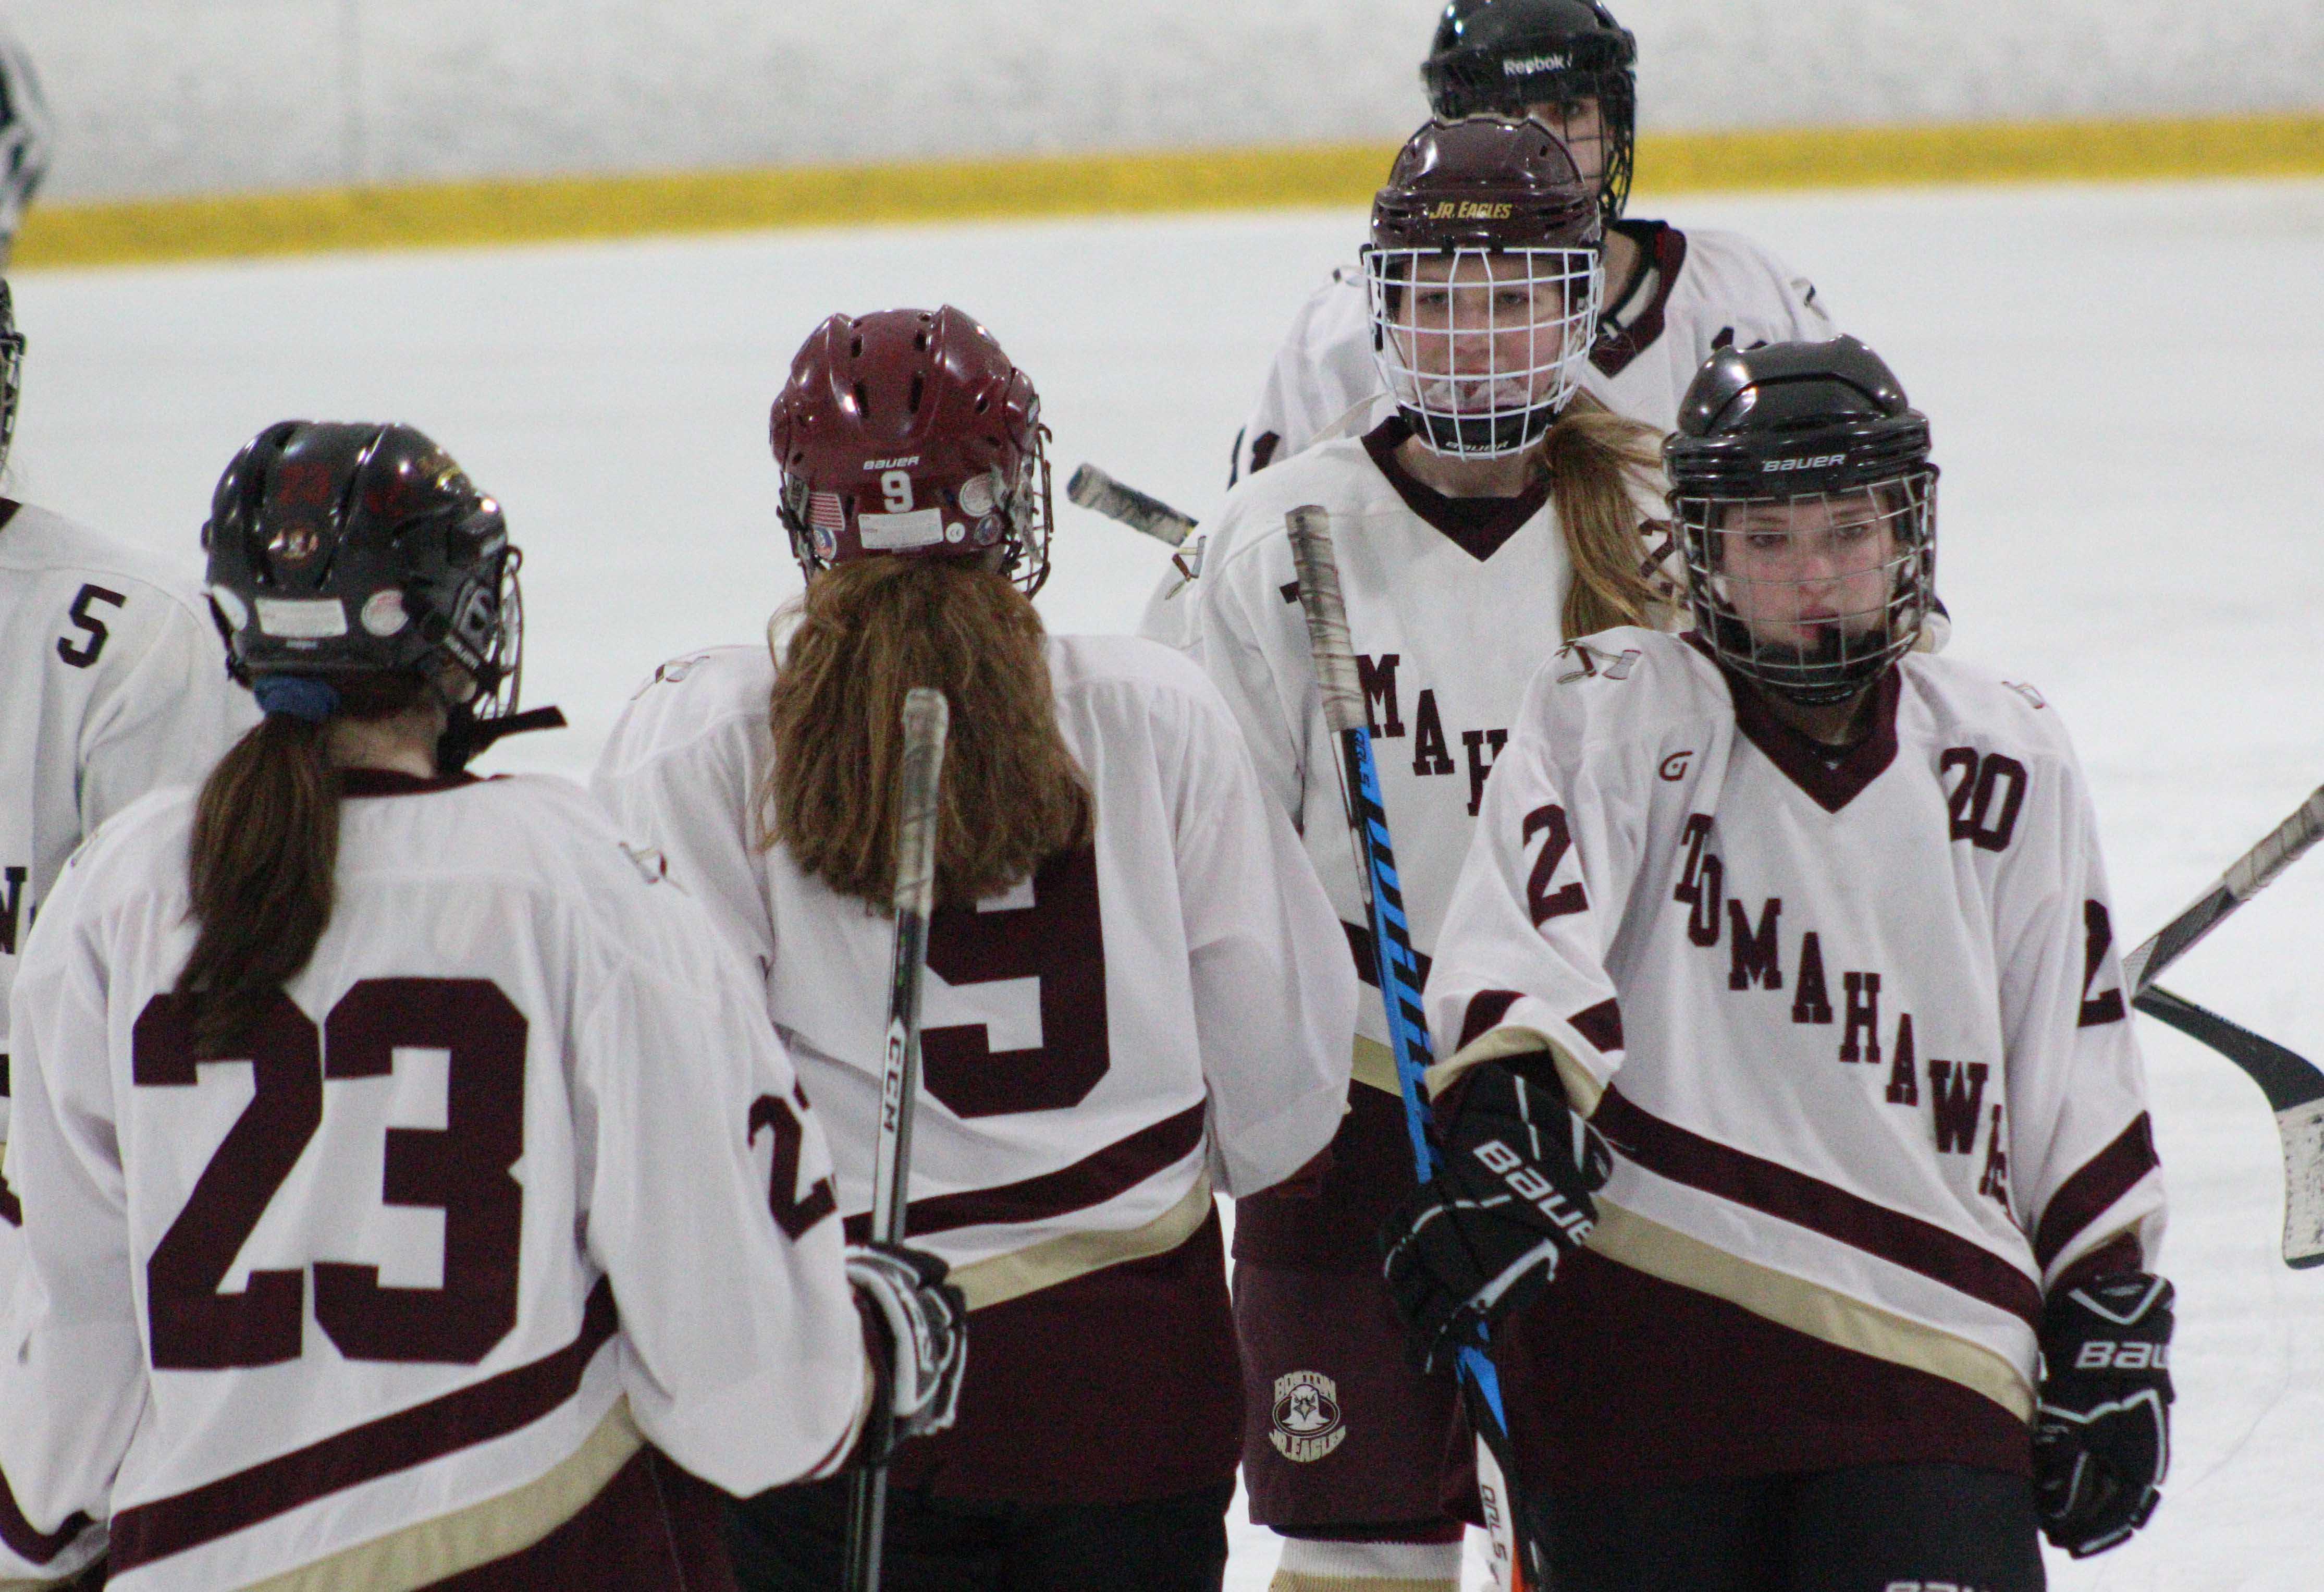 Girls Hockey vs. Leominster (Gallery)